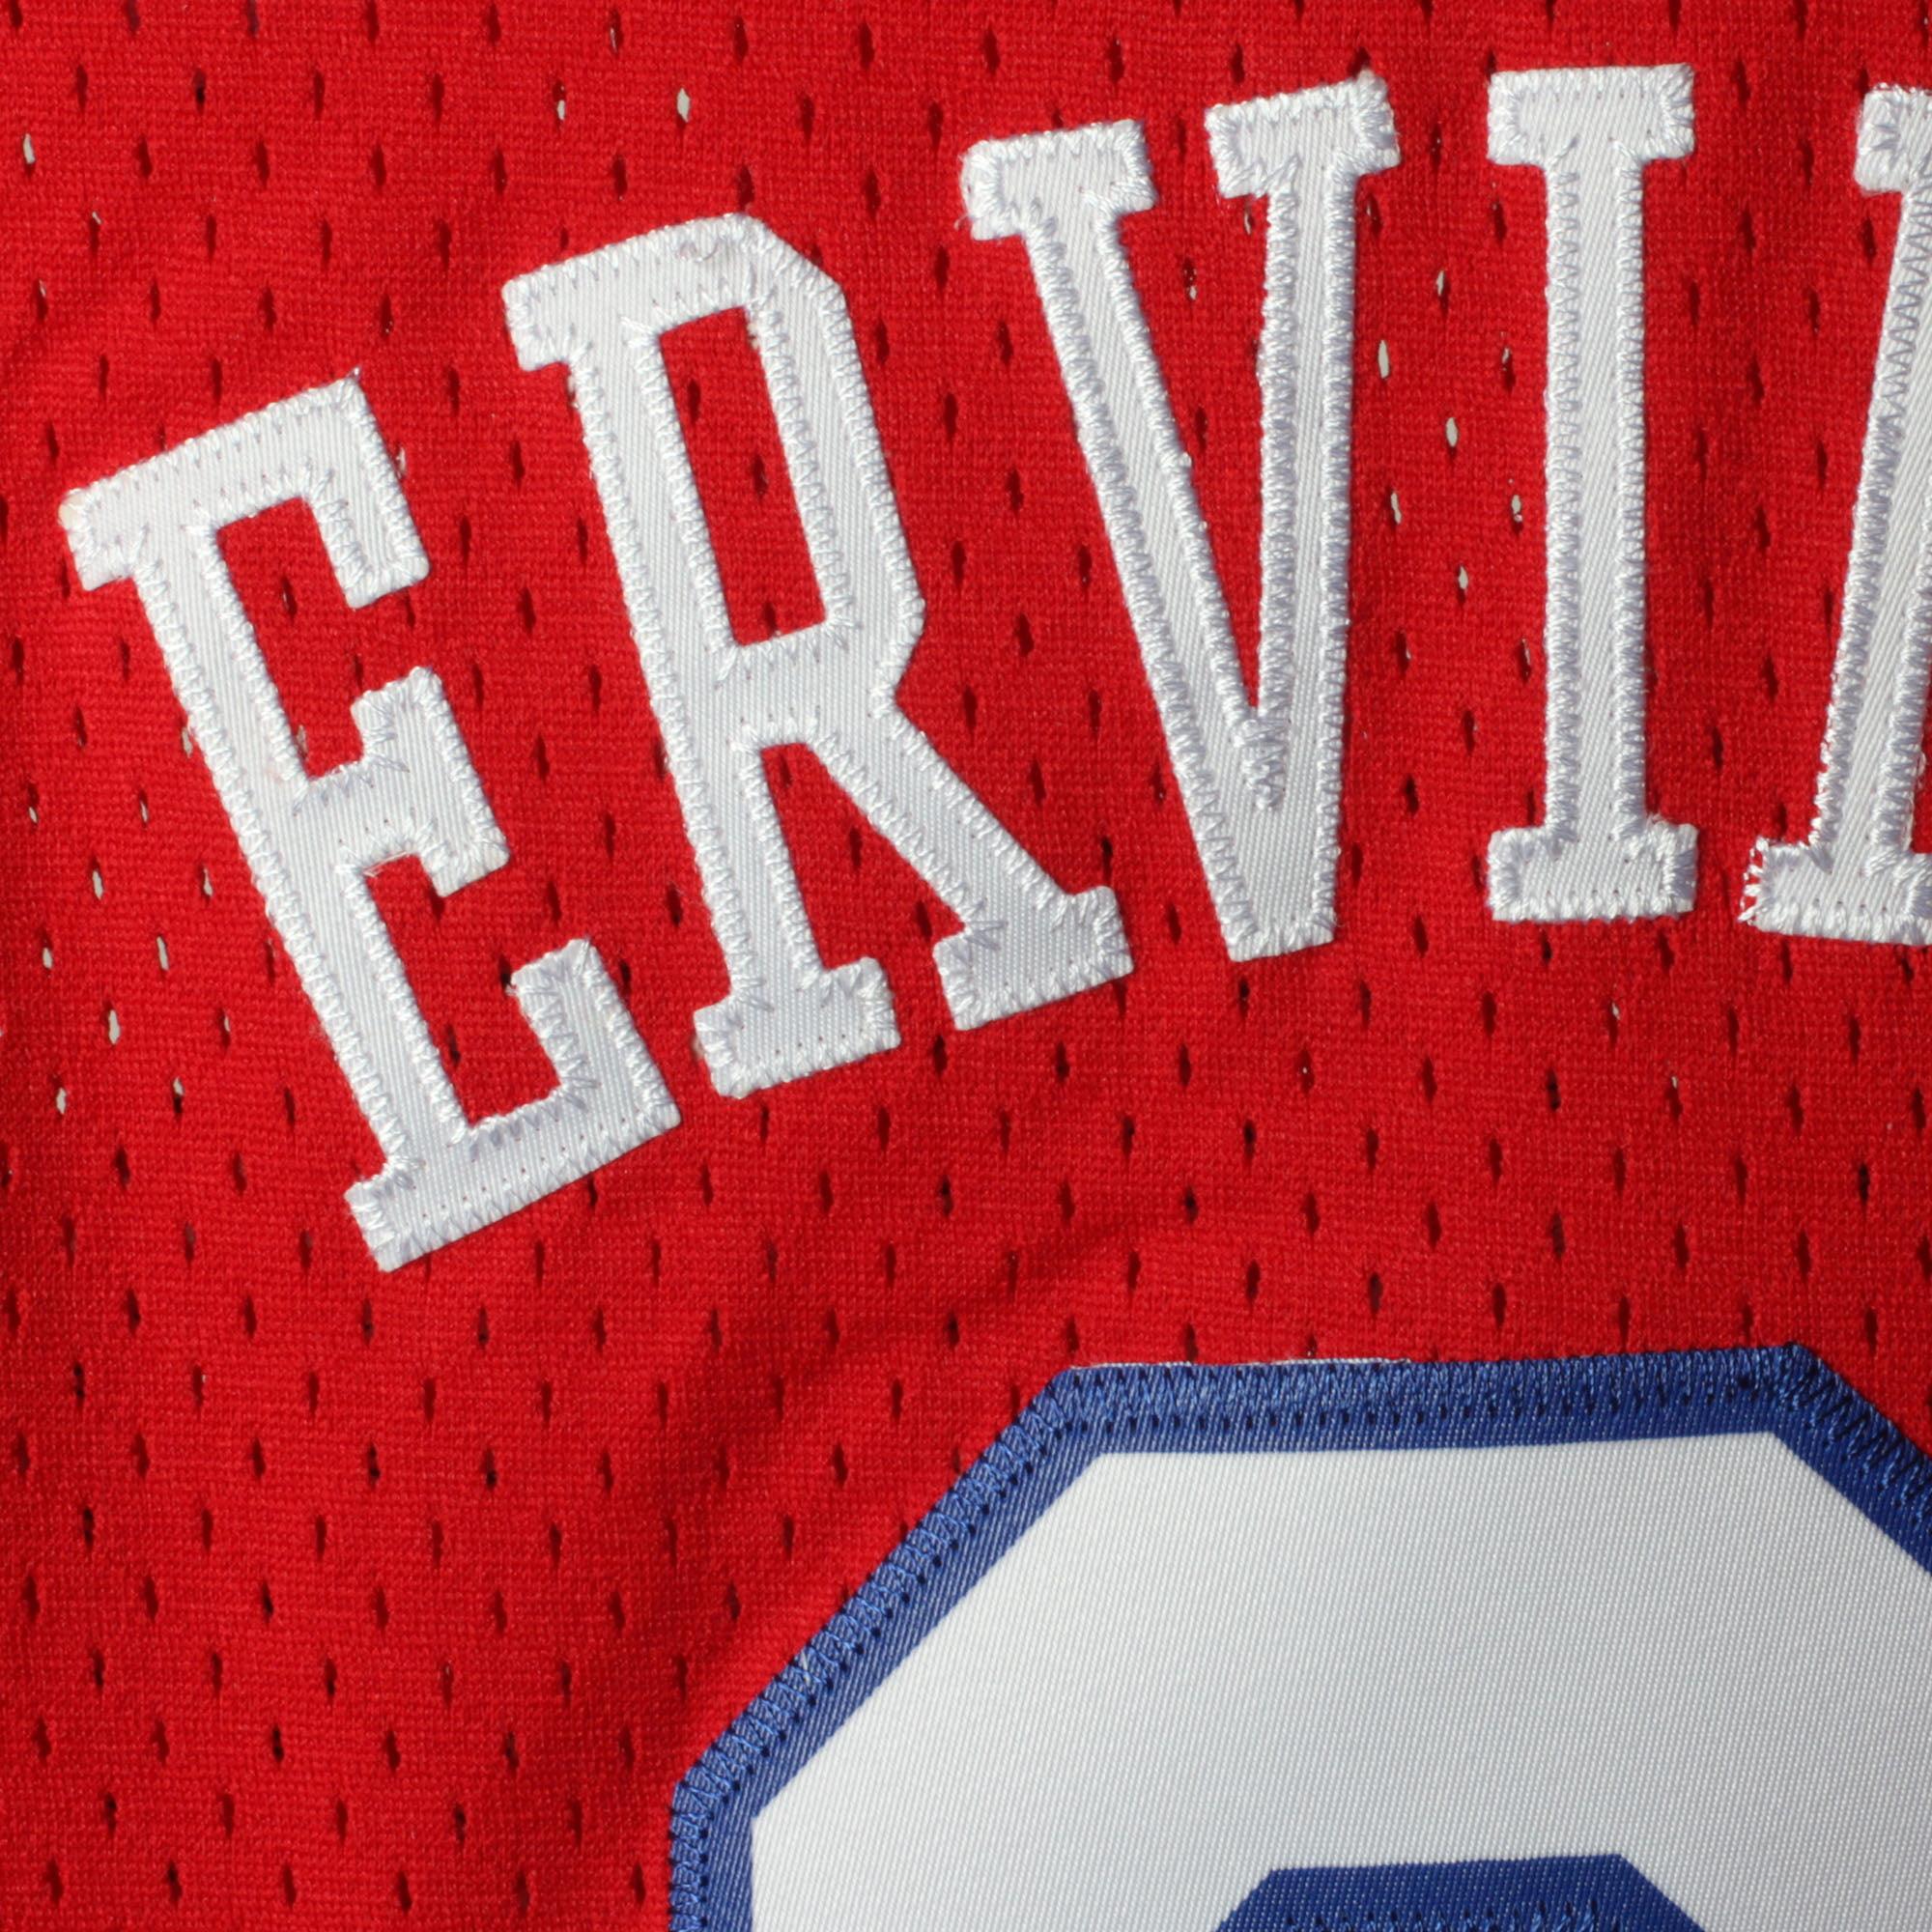 92ac6b5a1c0 Julius Erving Philadelphia 76ers Mitchell   Ness Youth Hardwood Classics  Swingman Jersey - Red - Walmart.com